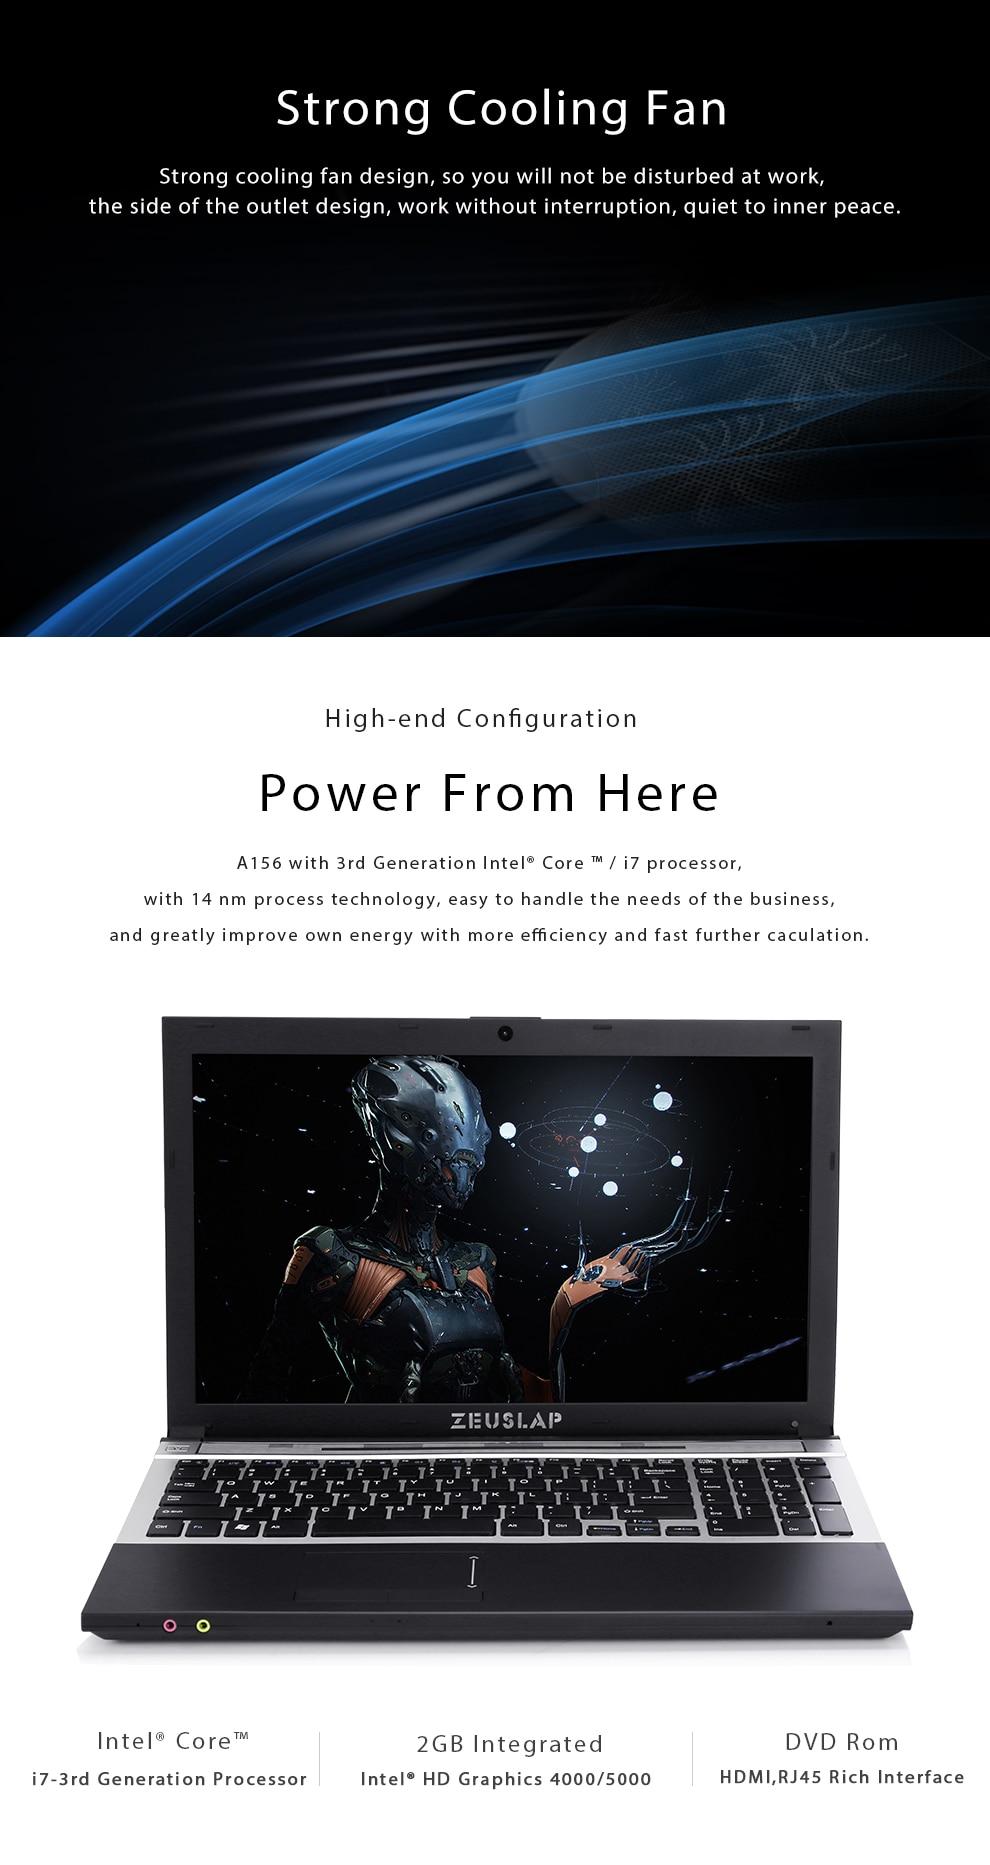 15.6inch intel core i7 8gb ram 500gb HDD 1920x1080 full hd screen  system with DVD ROM Laptop i7 8gb ram 500gb HDD black 6